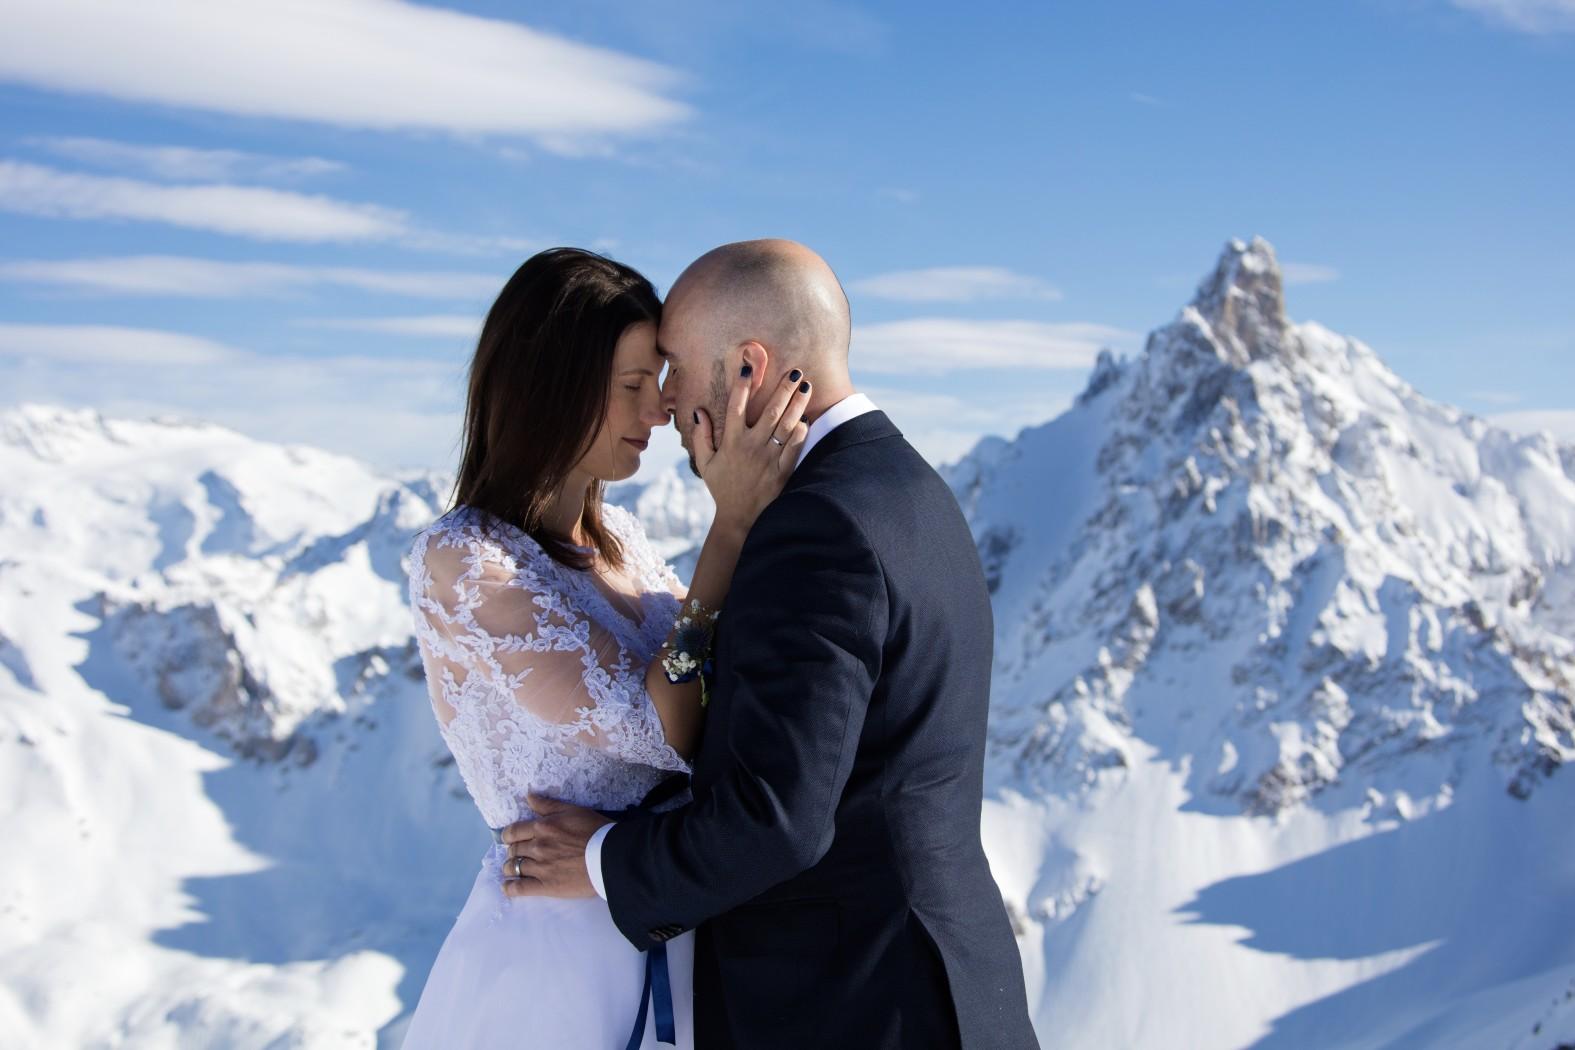 Photographe mariage Chambéry  Chambéry courchevel Winter wedding courchevel